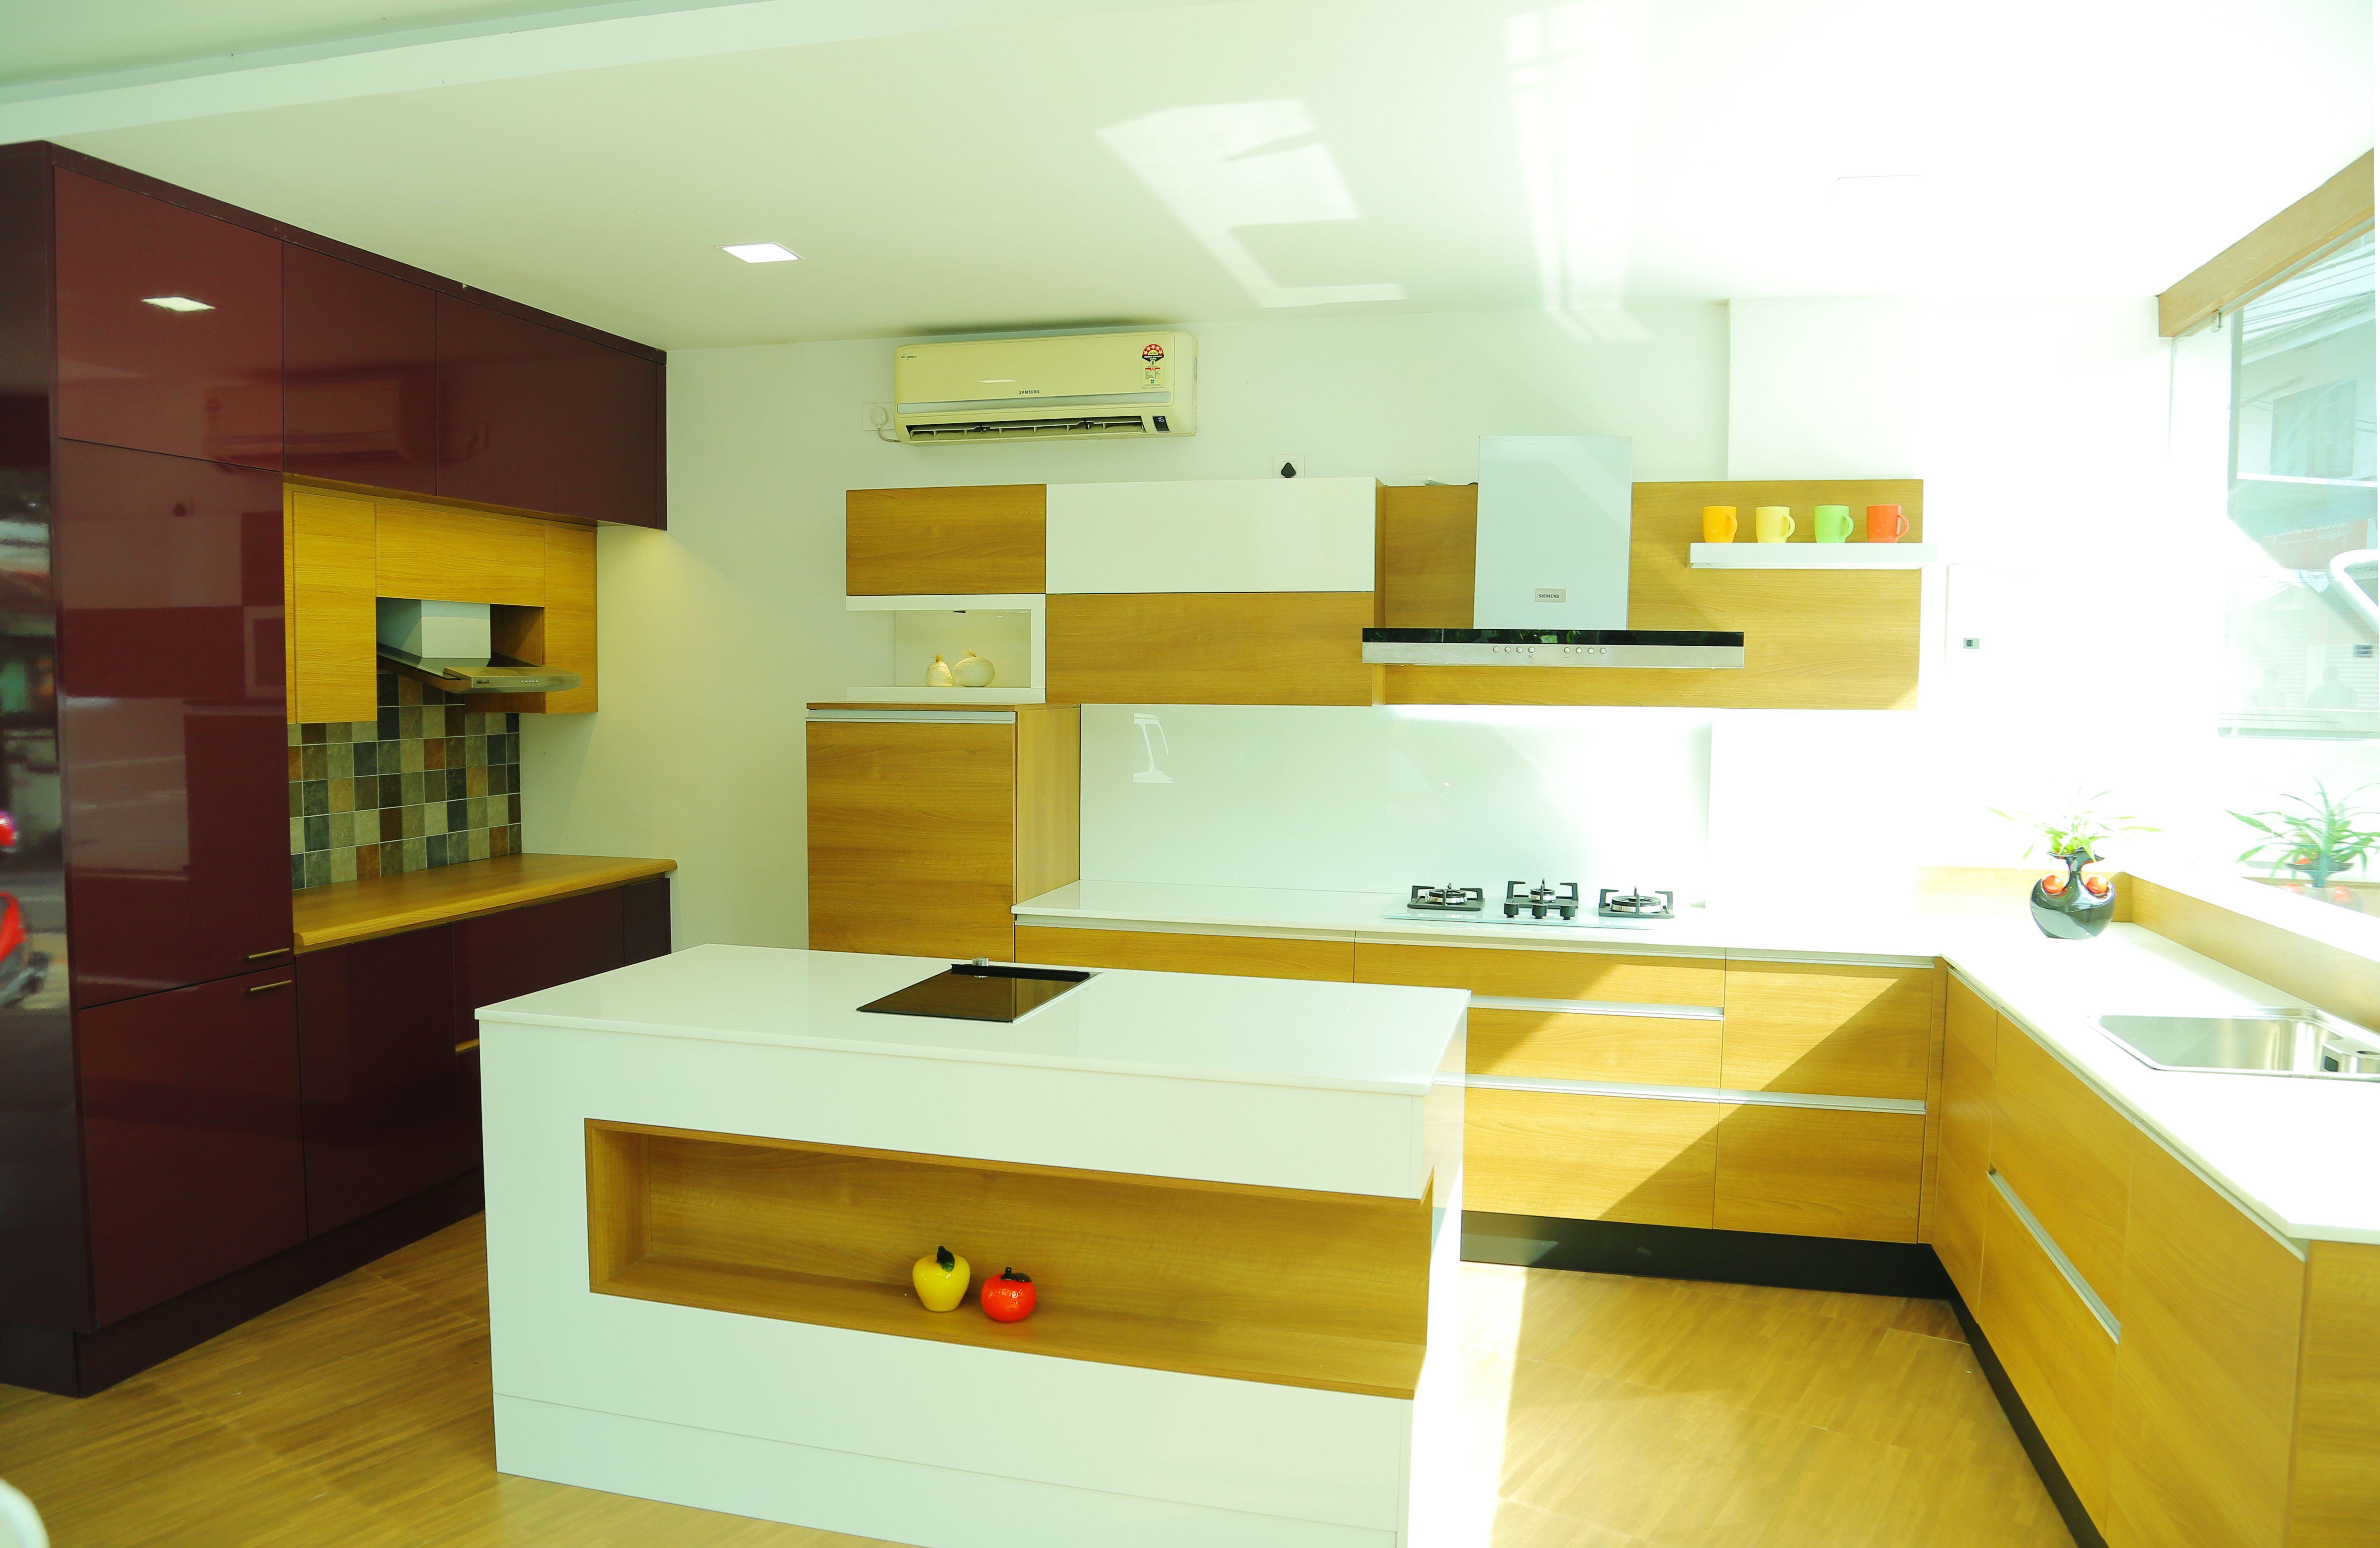 D'life home interiors - kottayam kottayam kerala velbros velbros on pinterest